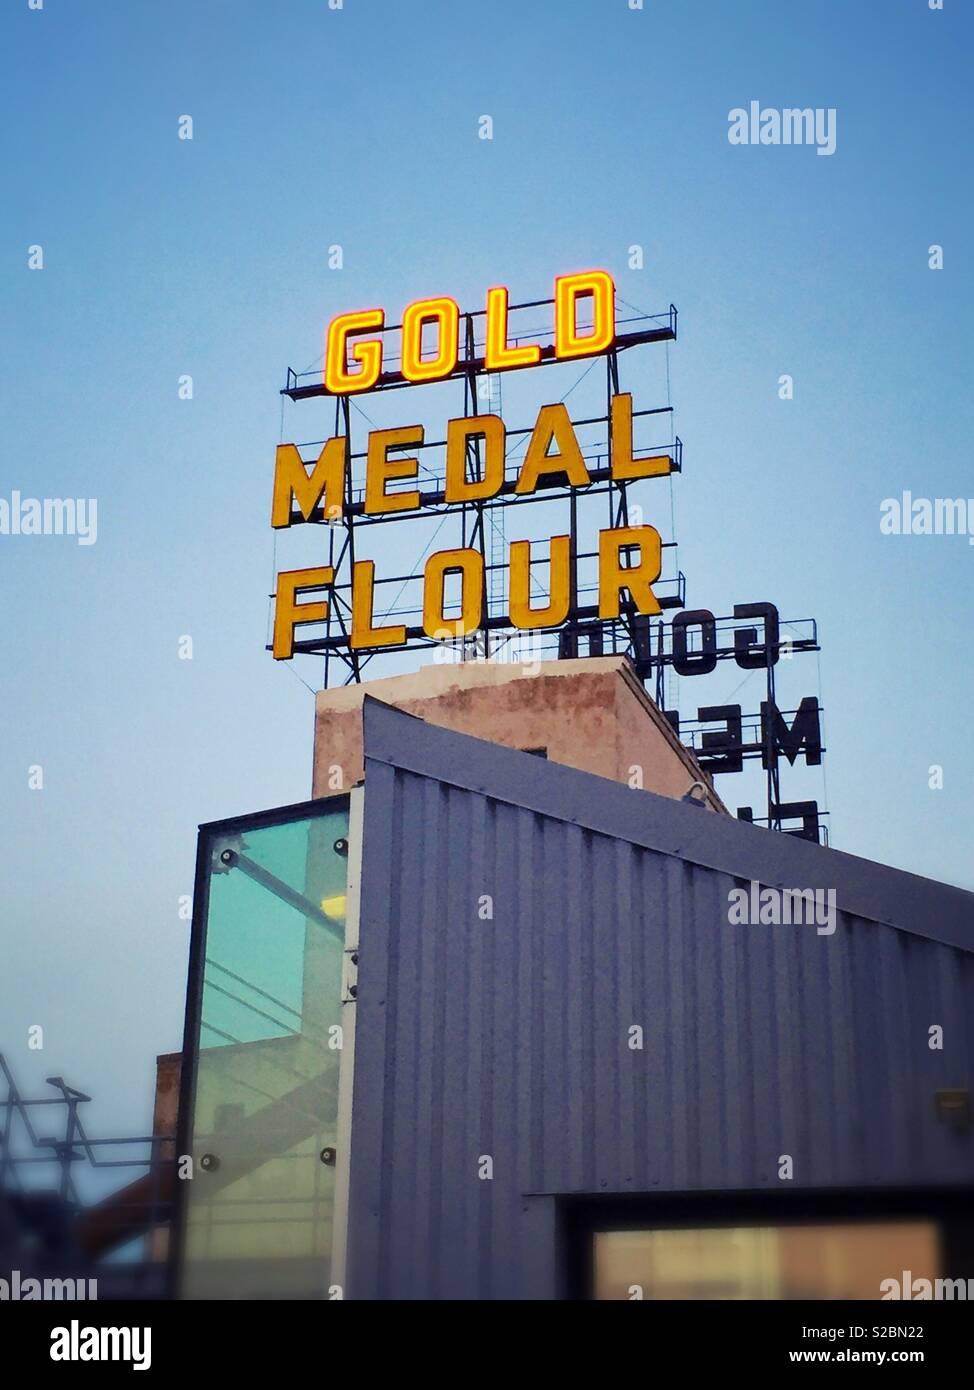 Gold Medal Flour - Stock Image